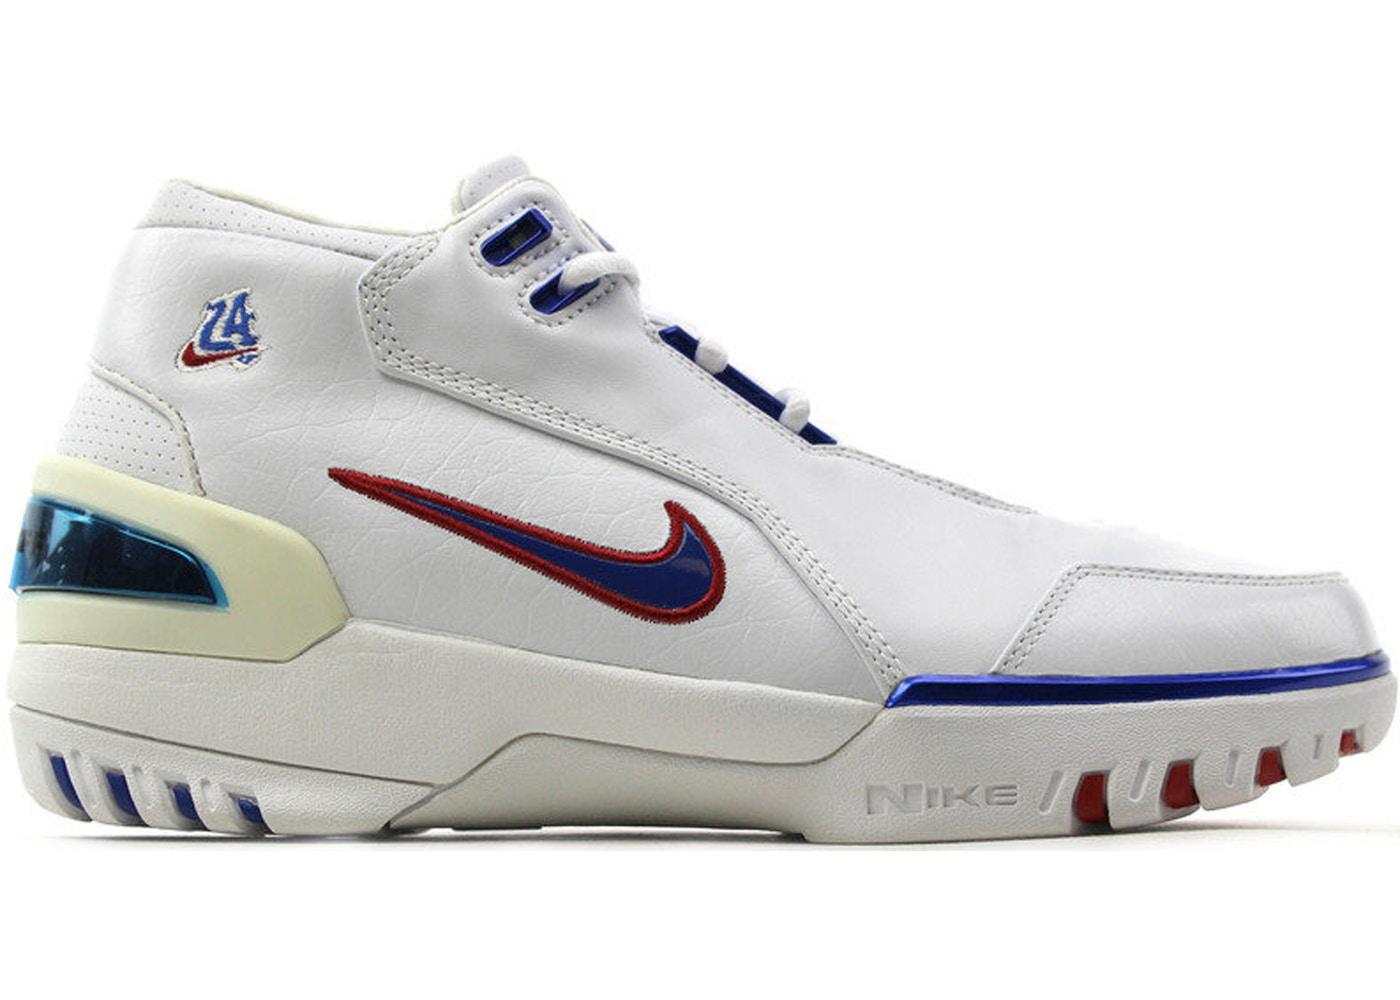 32b738e5a472 Buy Nike LeBron 1 Shoes   Deadstock Sneakers